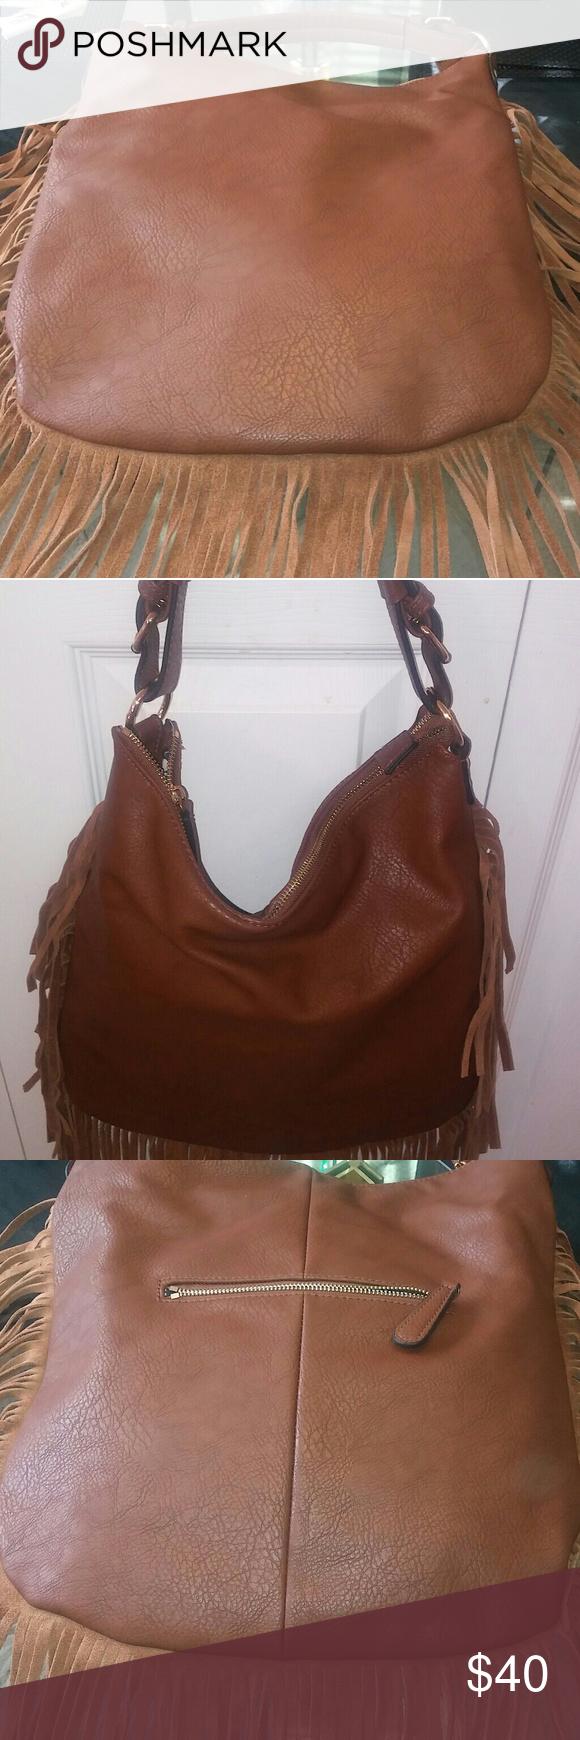 Crown Vintage Handbag New Never Worn Brown Fringes Three Compartments Bags Shoulder